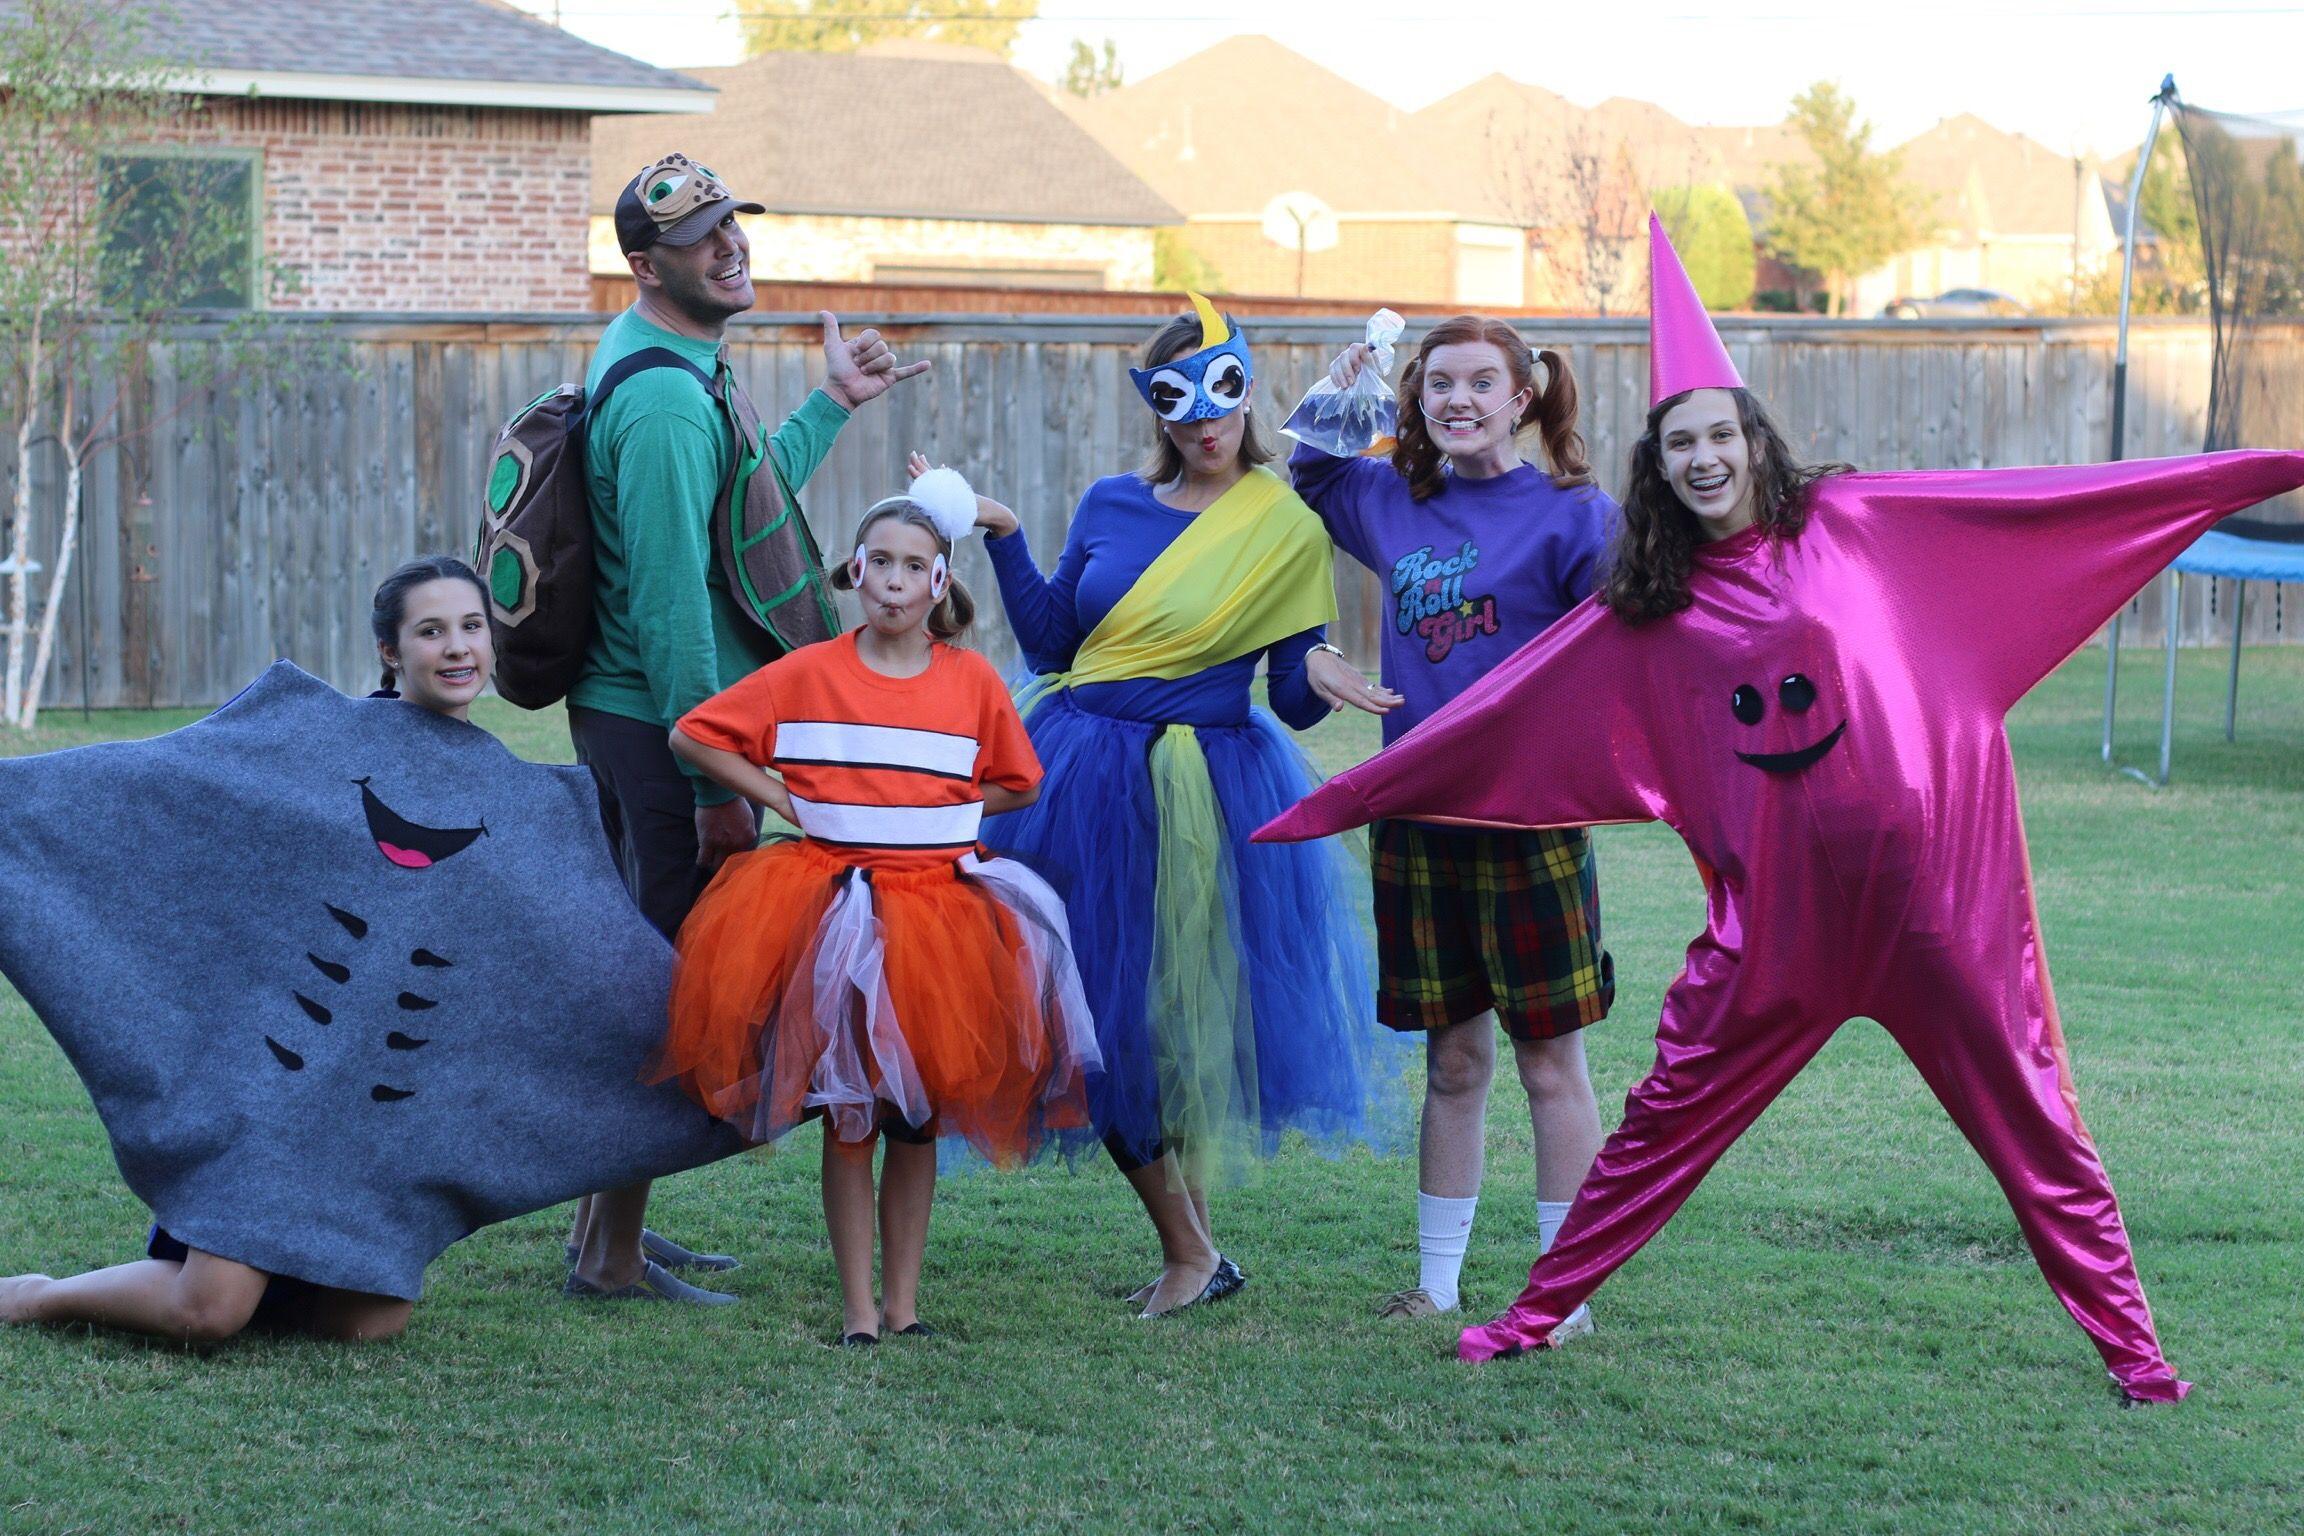 Finding Nemo Halloween Costumes!  sc 1 st  Pinterest & Finding Nemo Halloween Costumes! | Halloween Costumes | Pinterest ...